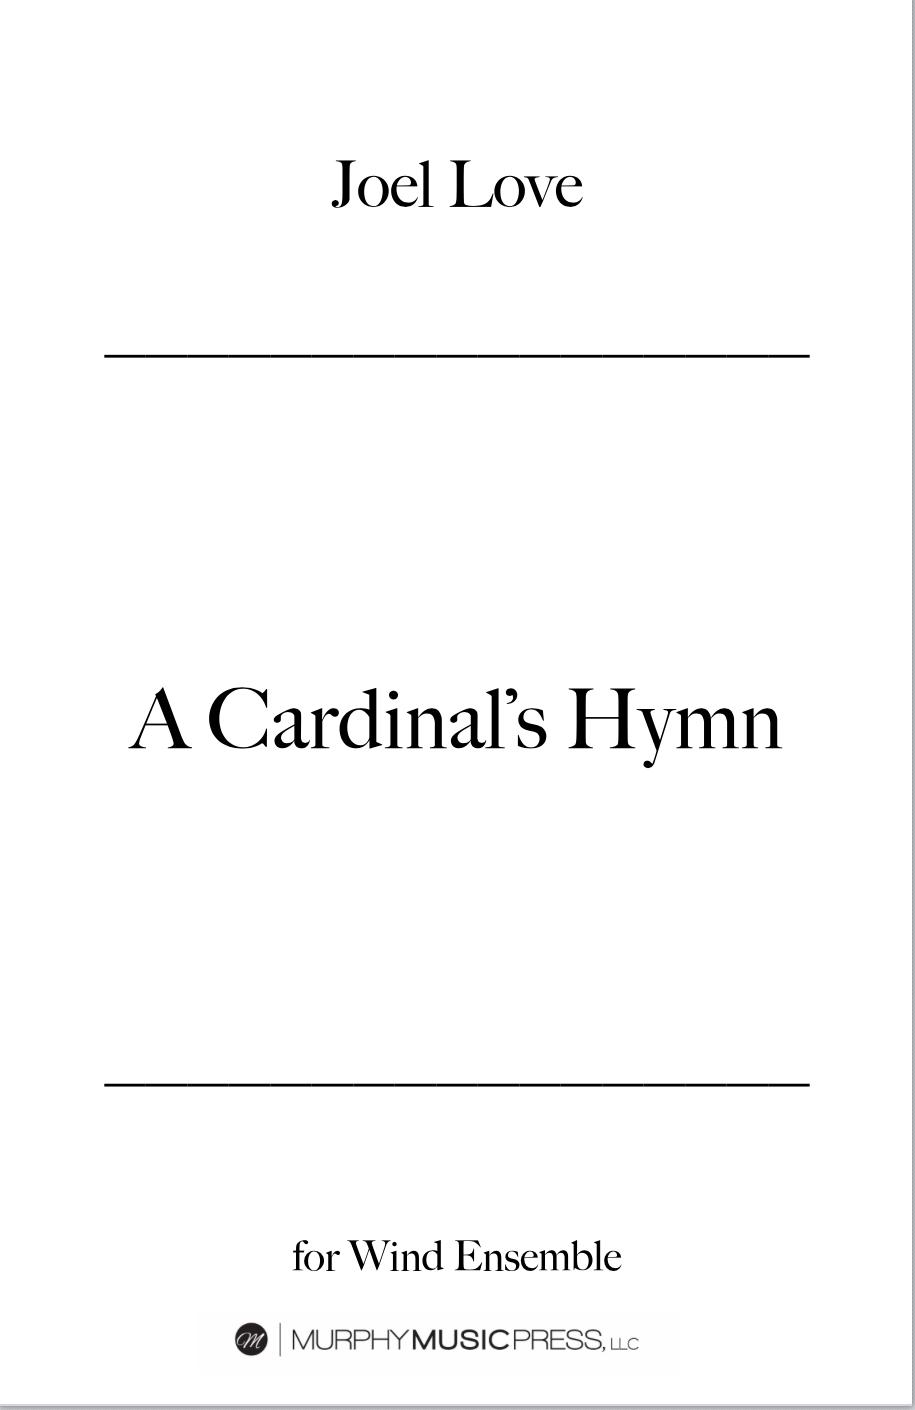 A Cardinals Hymn  by Joel Love